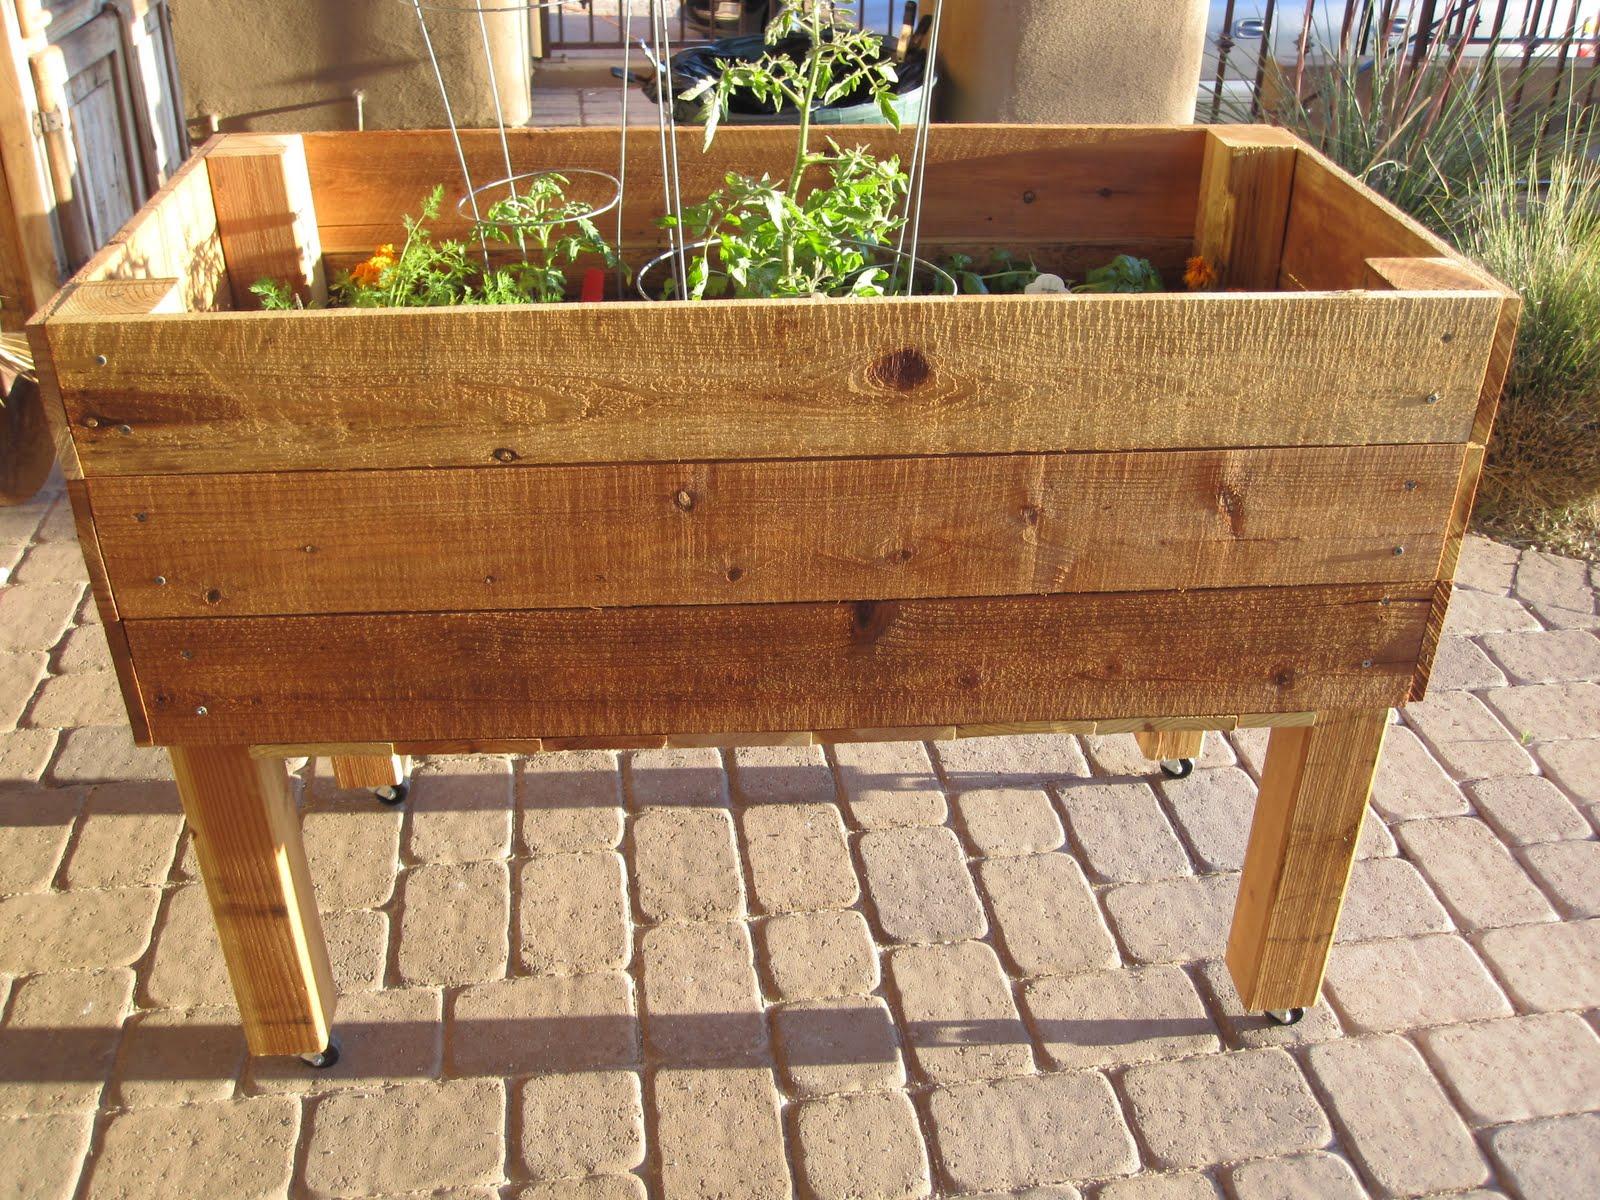 Herb Garden On Wheels | Sevenstonesinc.com